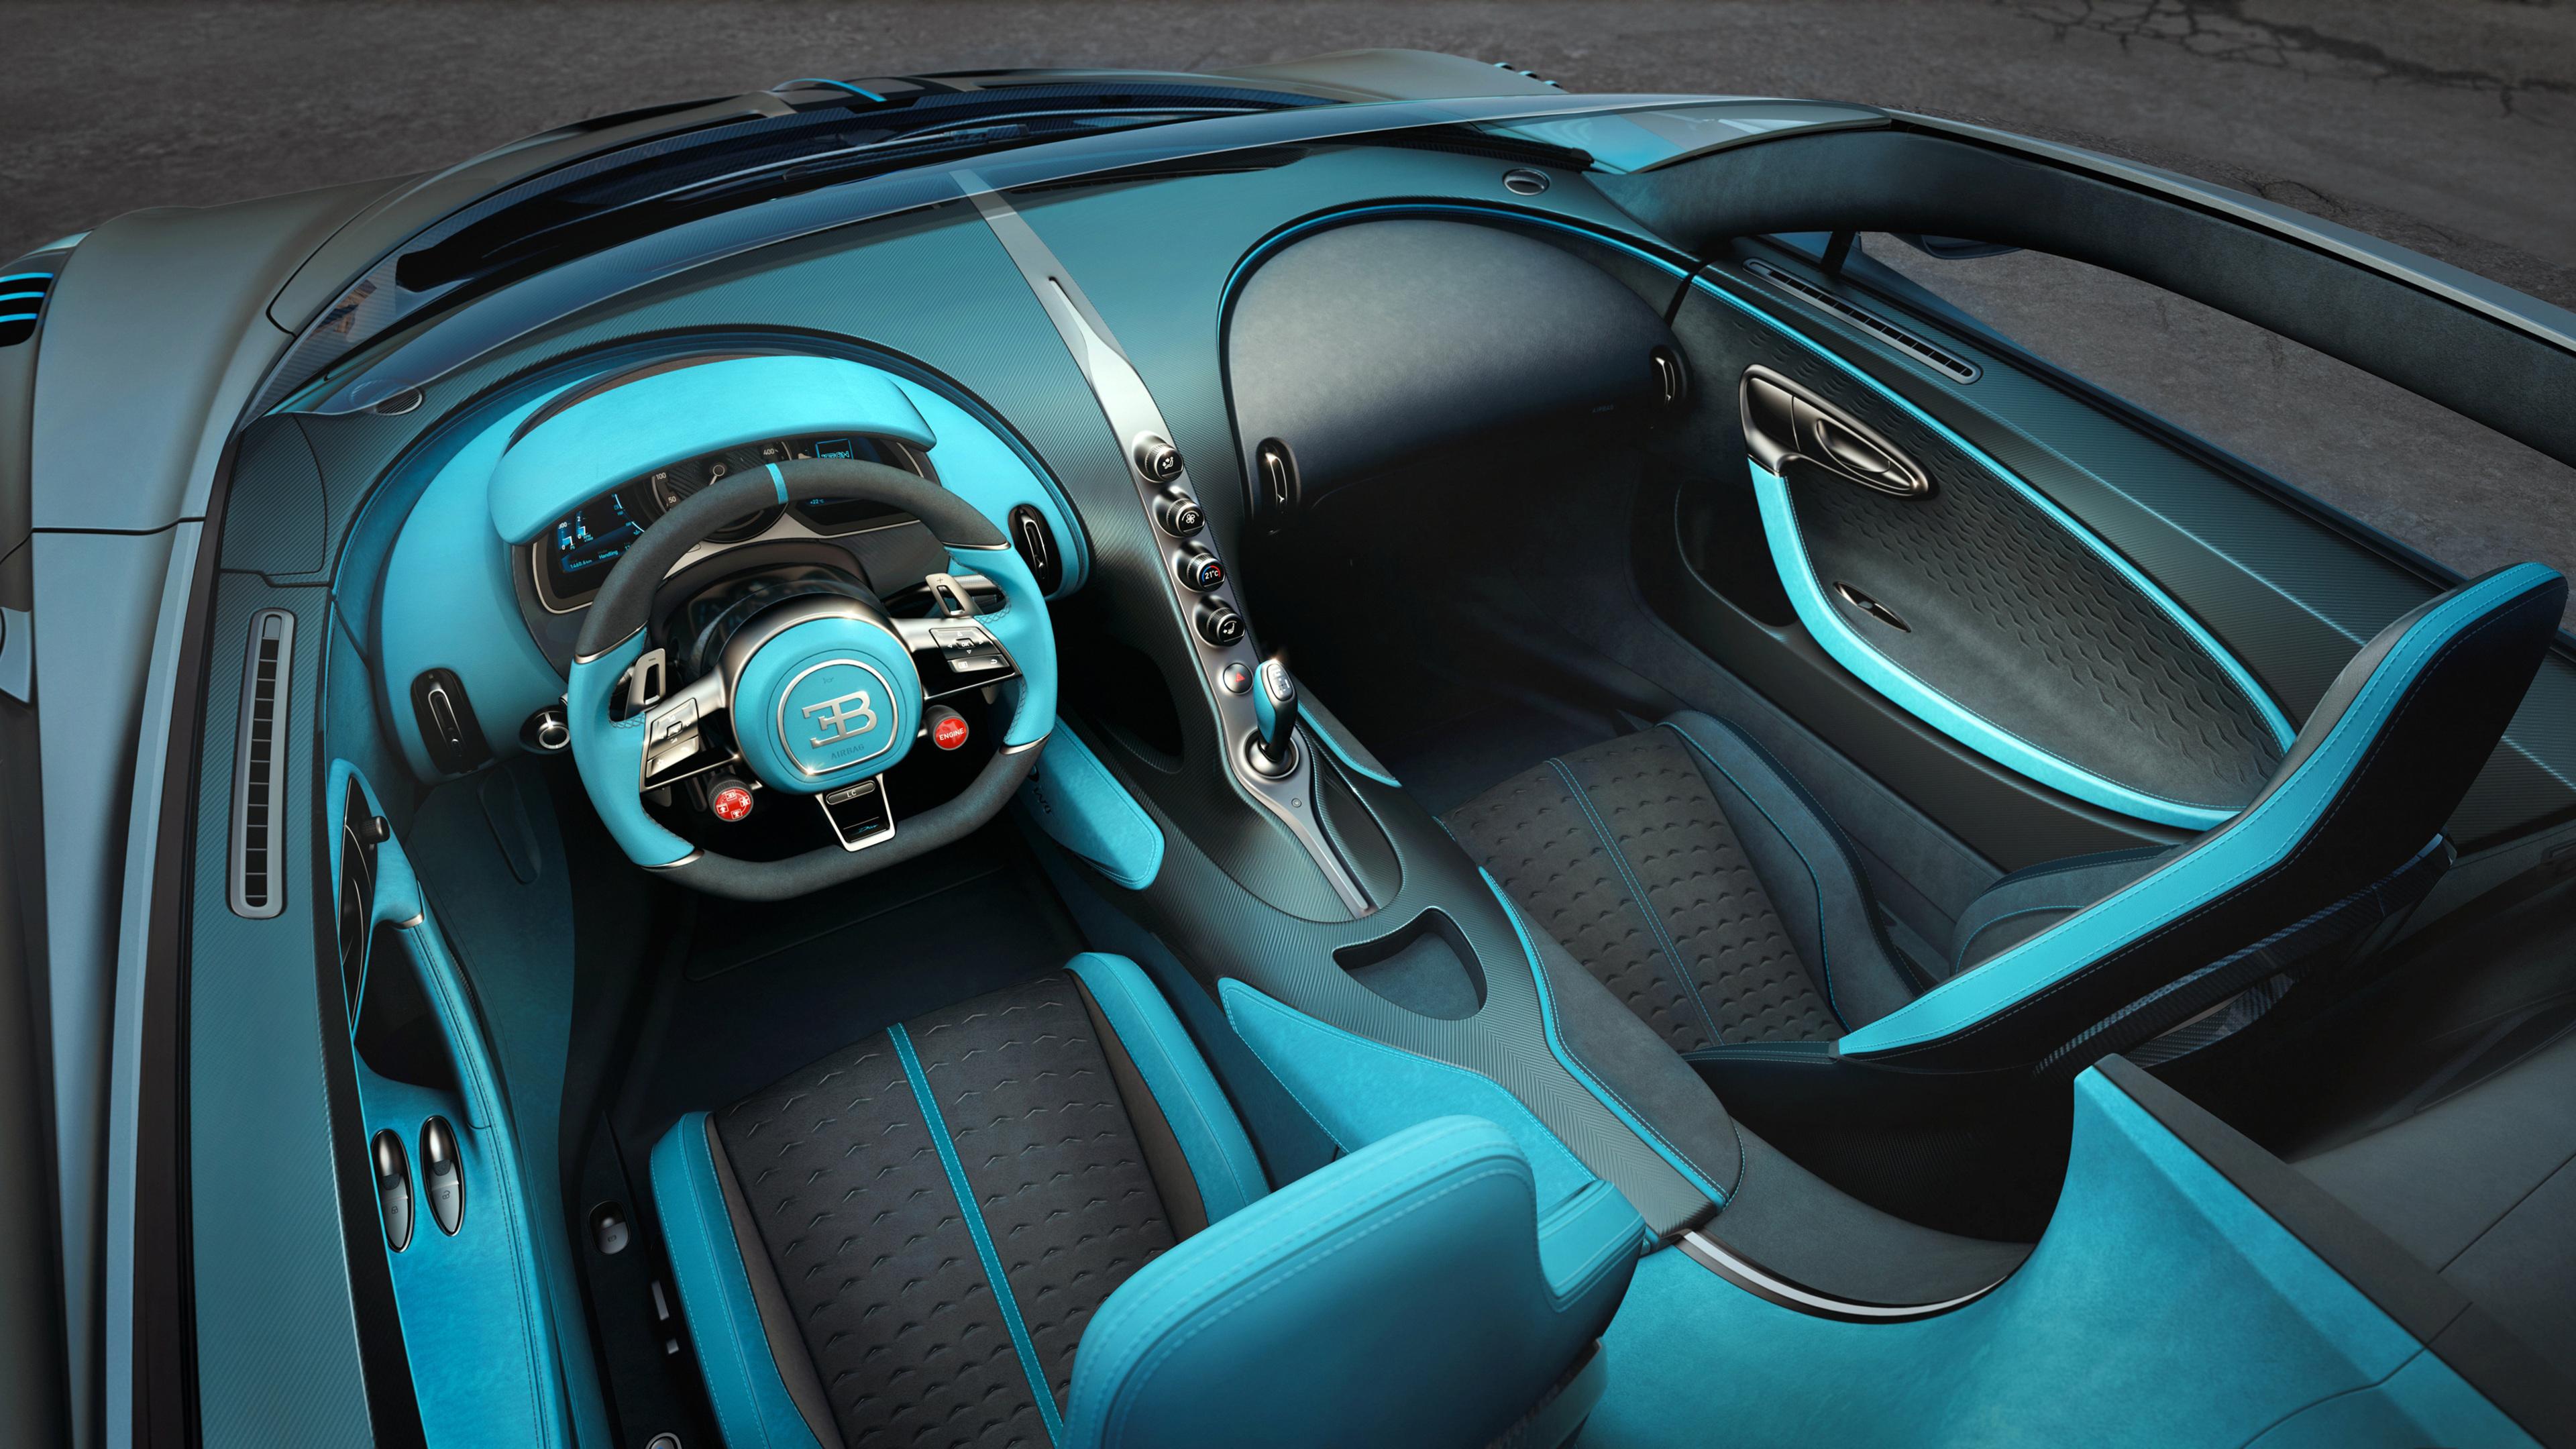 bugatti divo interior 4k 1539114274 - Bugatti Divo Interior 4k - hd-wallpapers, cars wallpapers, bugatti wallpapers, bugatti divo wallpapers, 4k-wallpapers, 2018 cars wallpapers